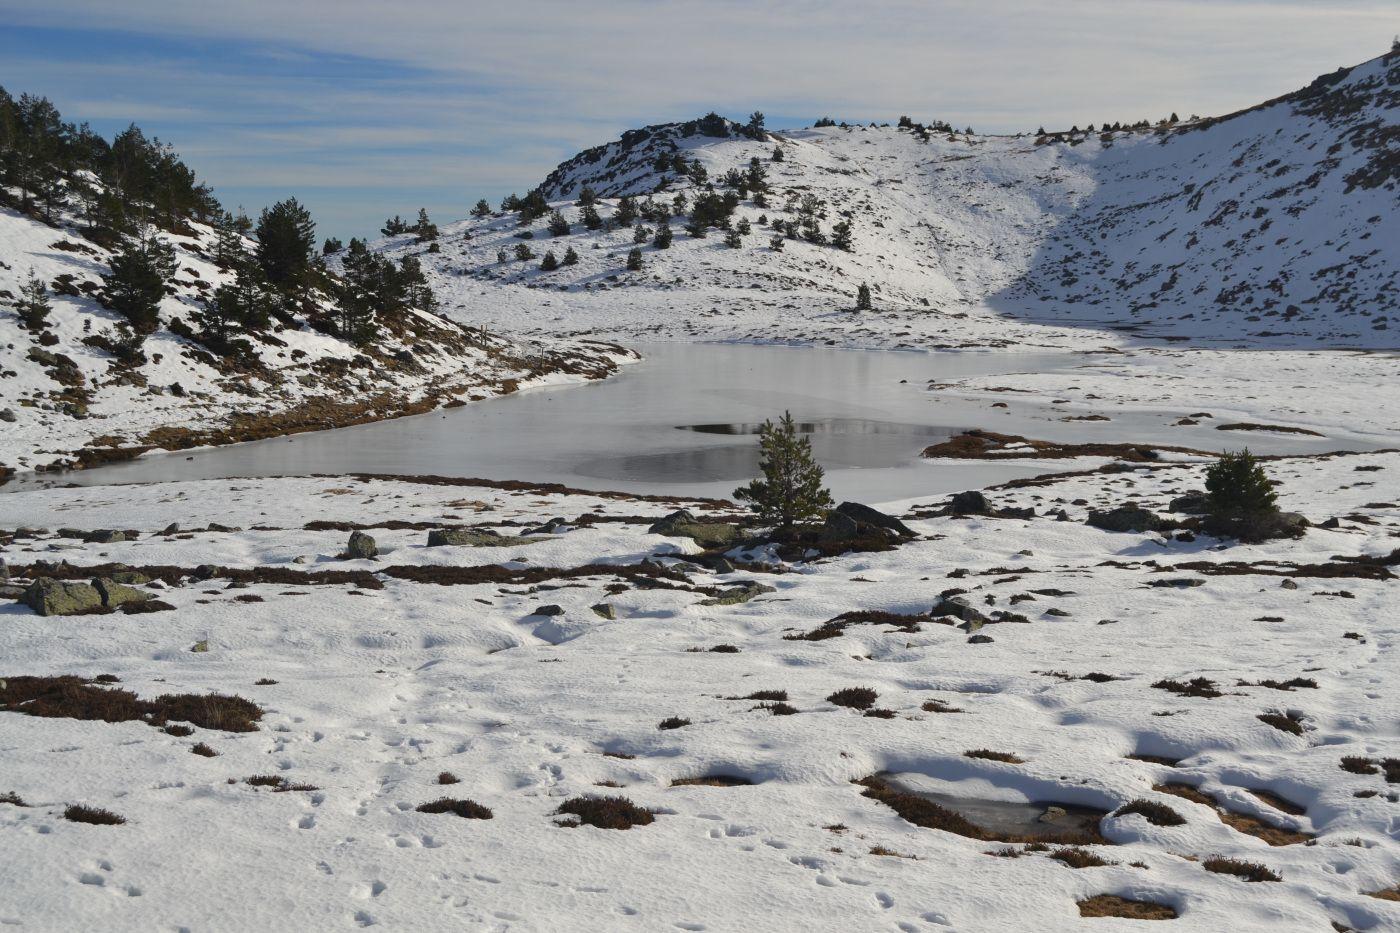 Laguna Larga